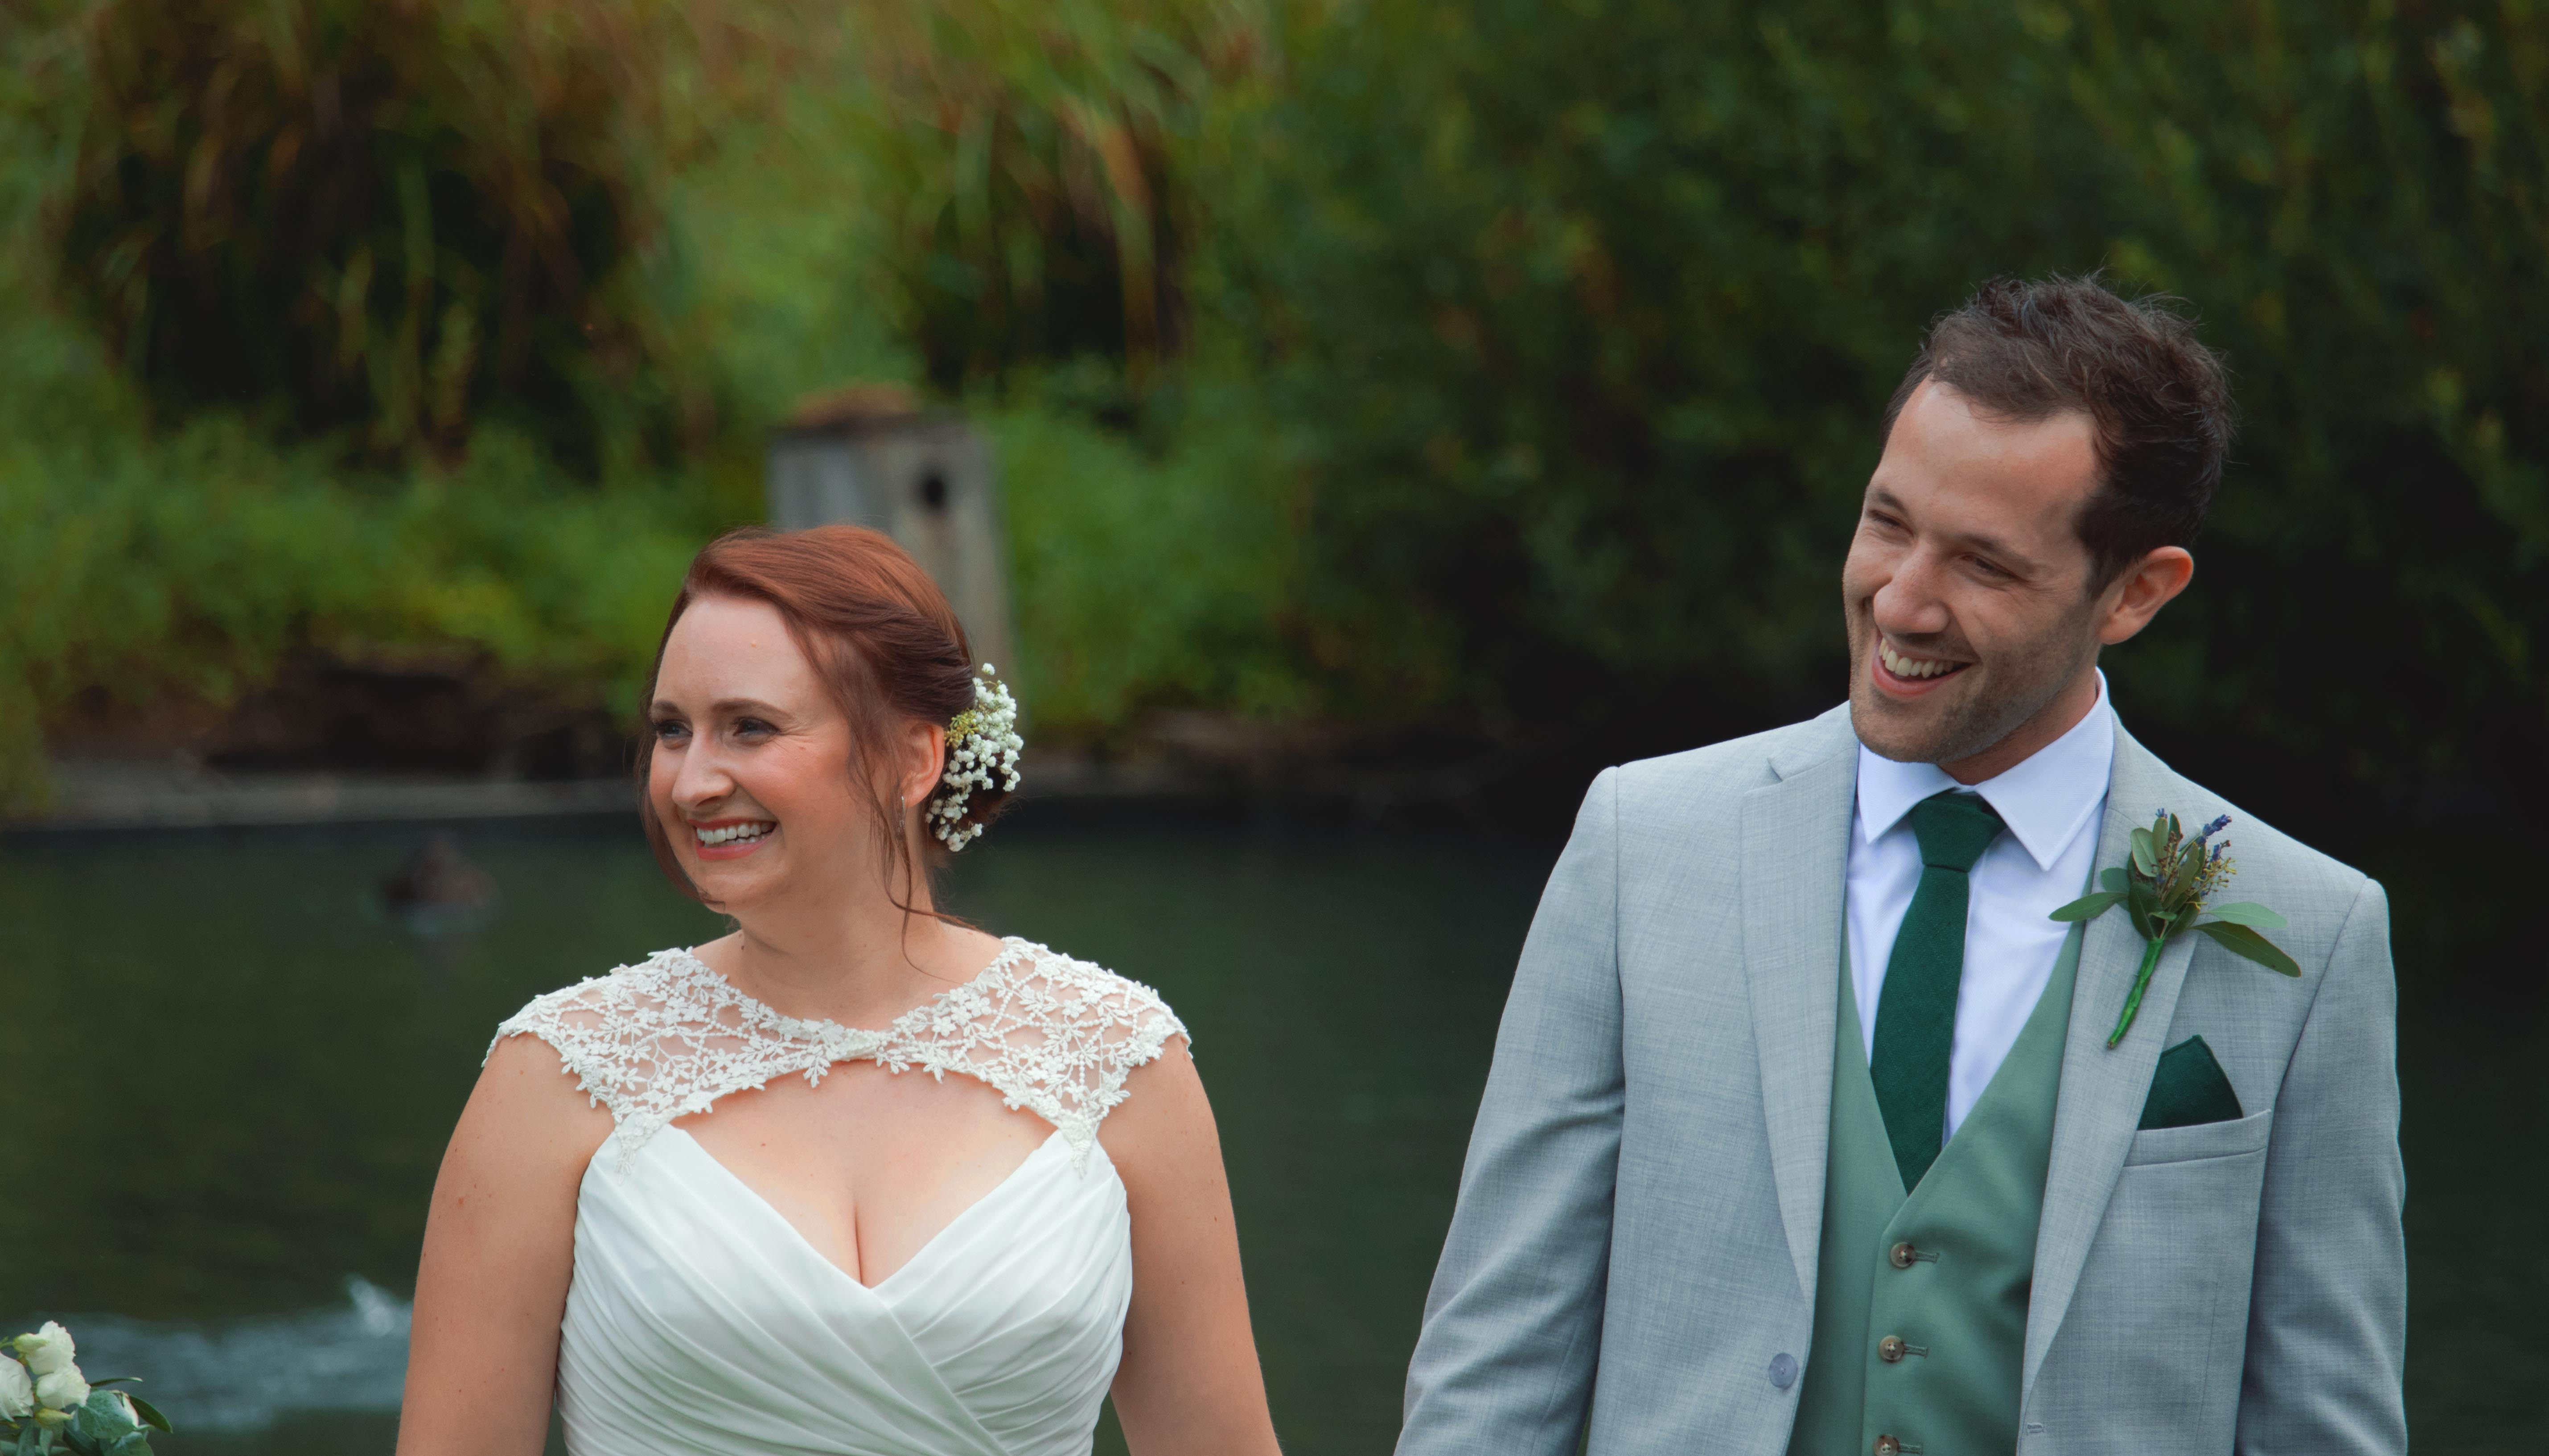 Candid Outdoor Wedding Ceremony